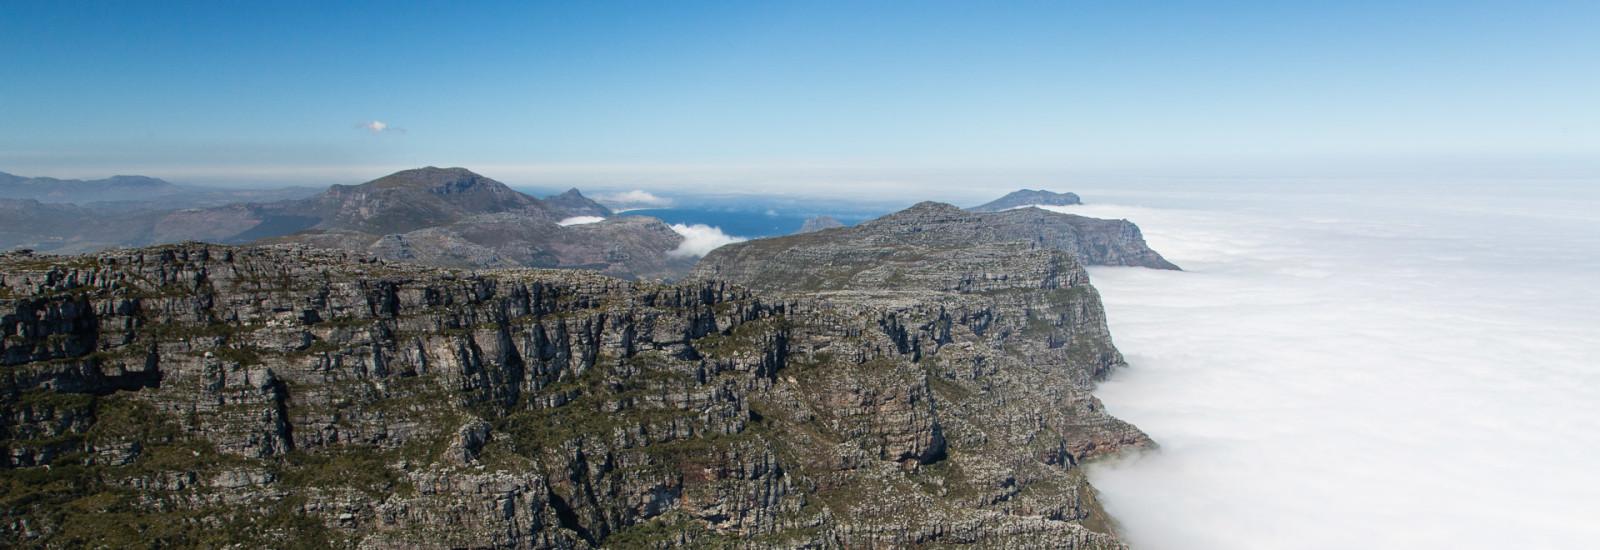 28.10. Tafelberg - Blick Richtung Westen